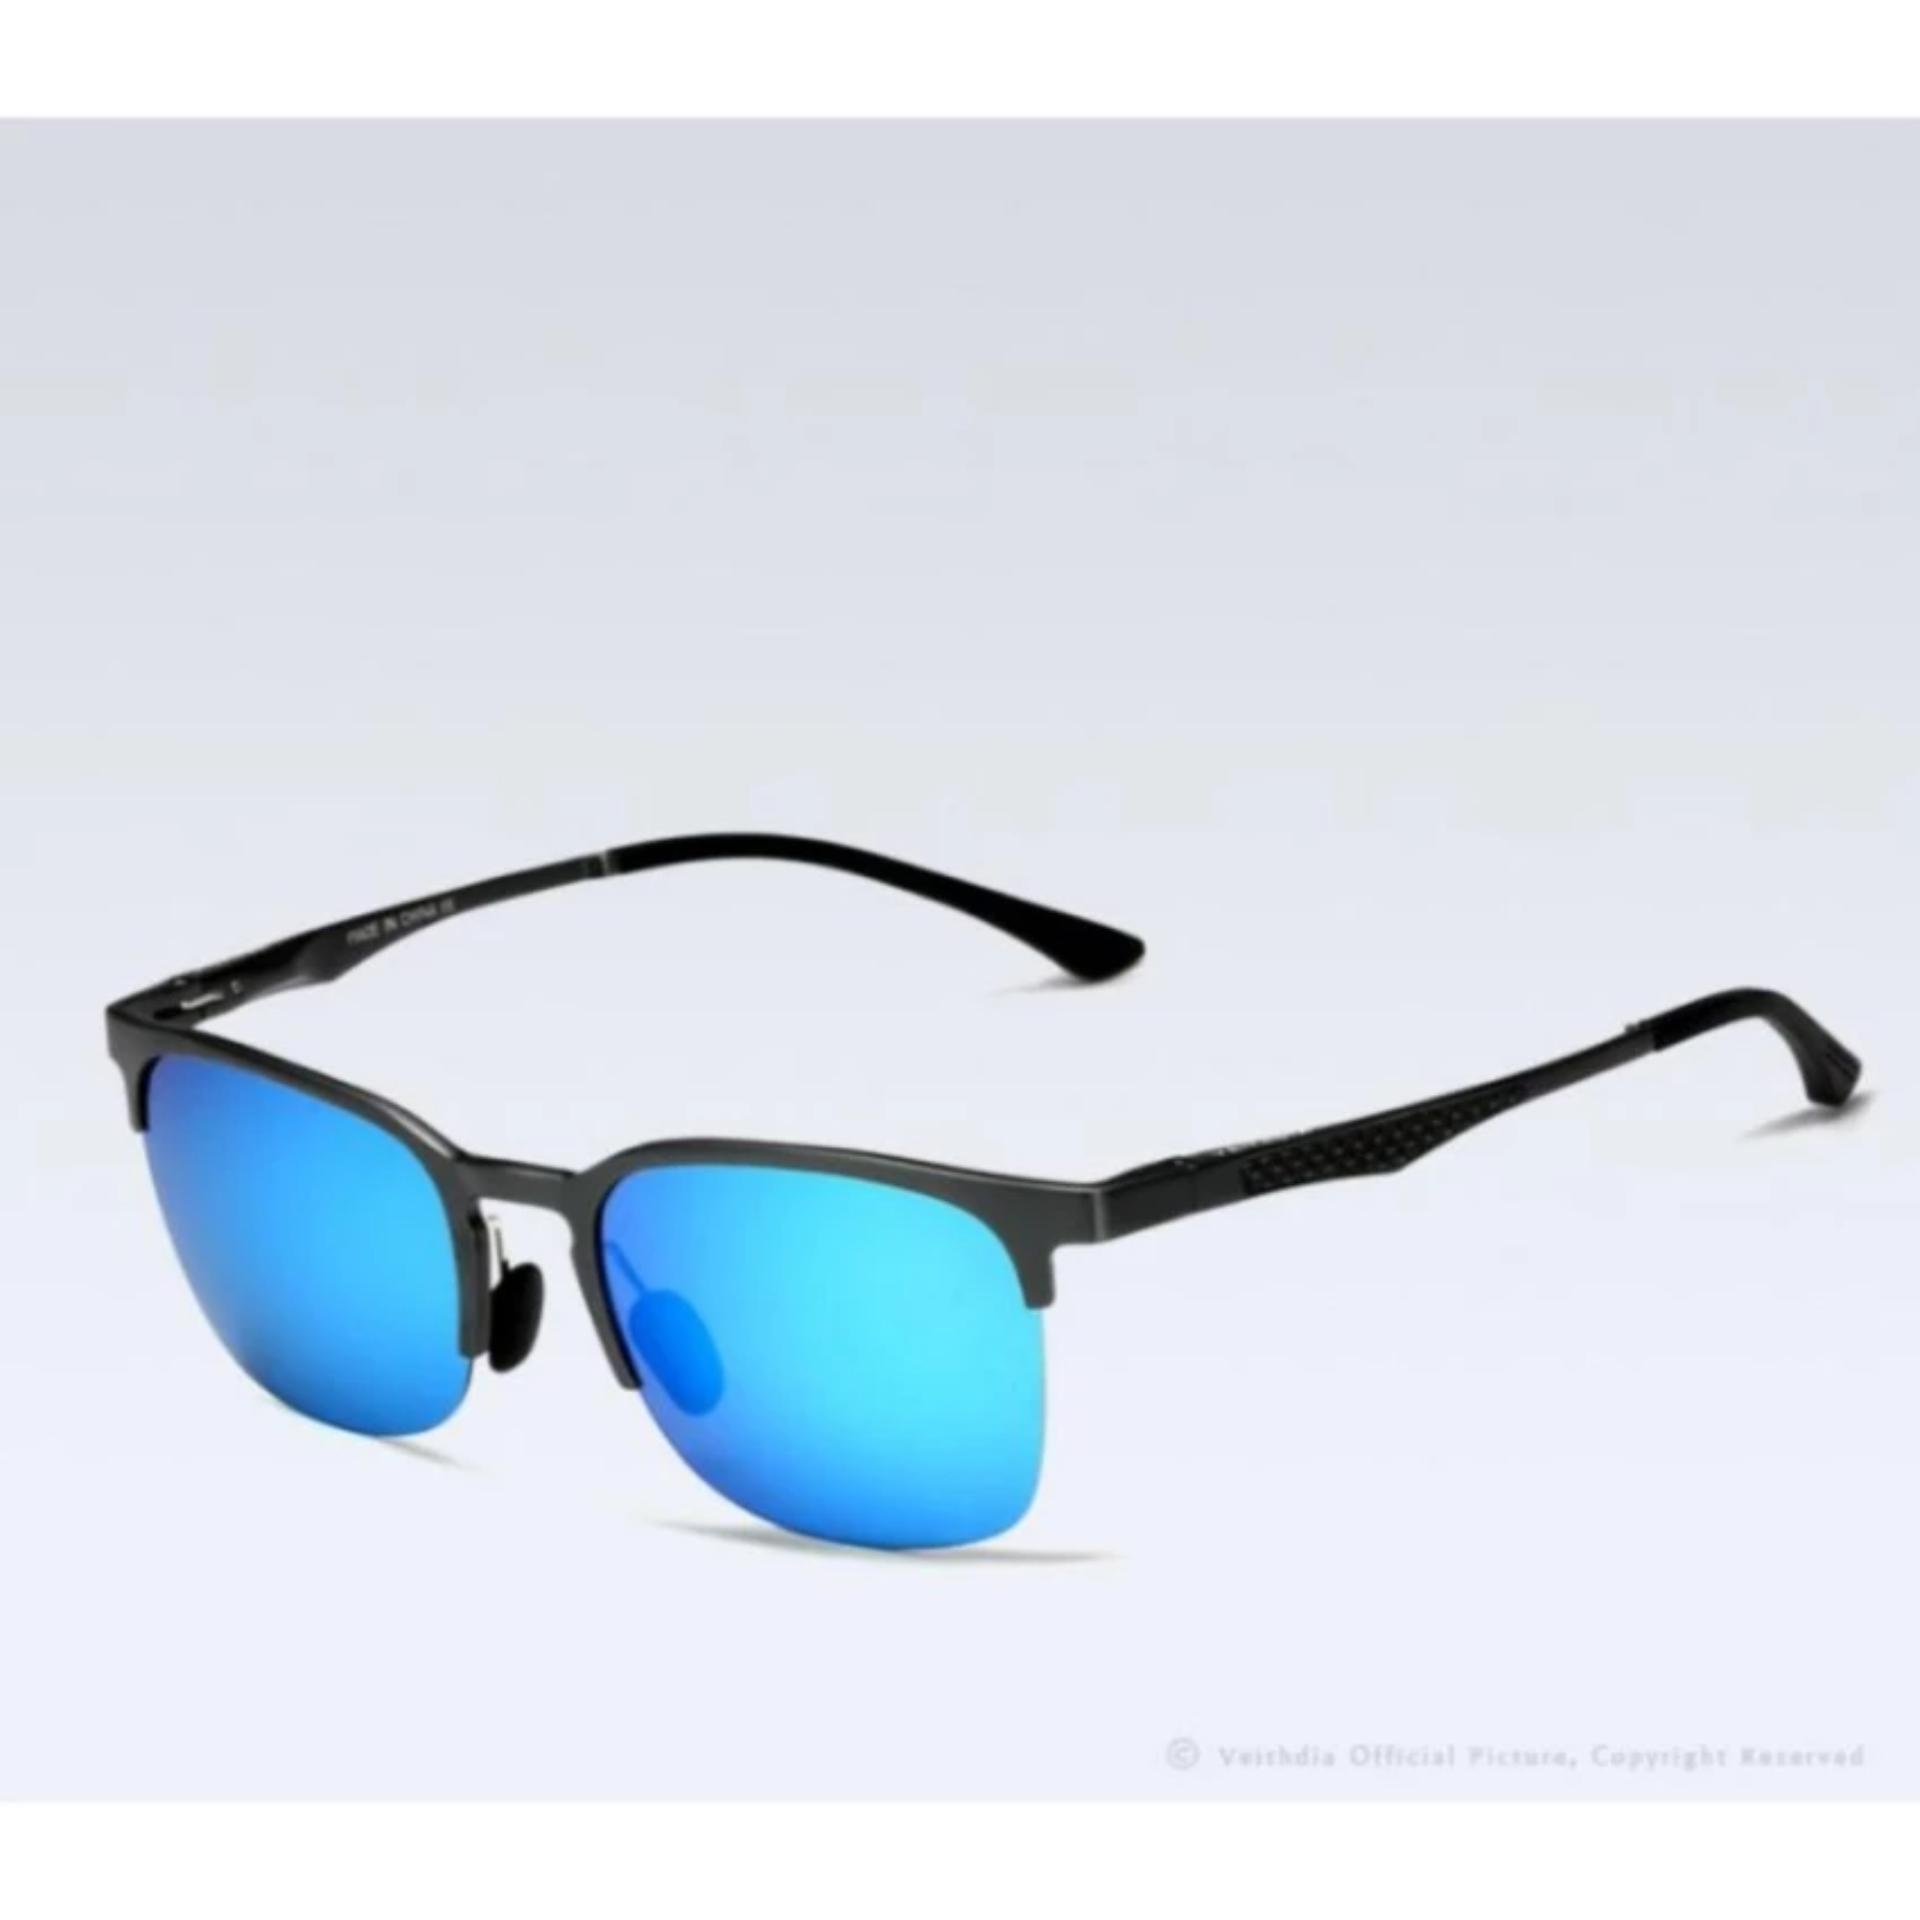 VEITHDIA Terpolarisasi Kacamata Hitam Pria Perak Bingkai Kelabu Lensa  3043IDR90000. Rp 99.900 489f5d8e97